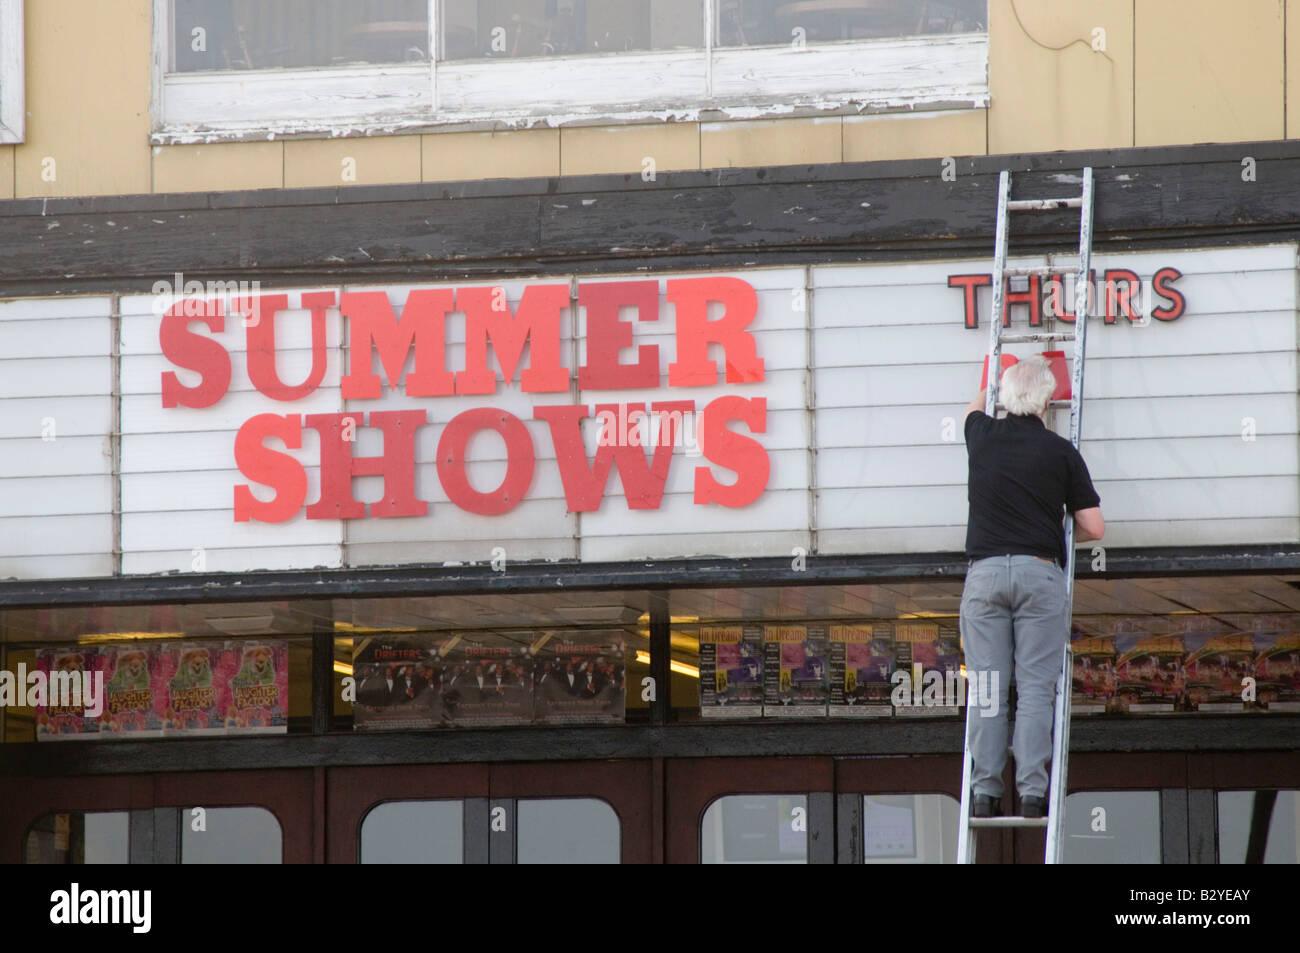 showbiz showbusiness summer season resort - Stock Image